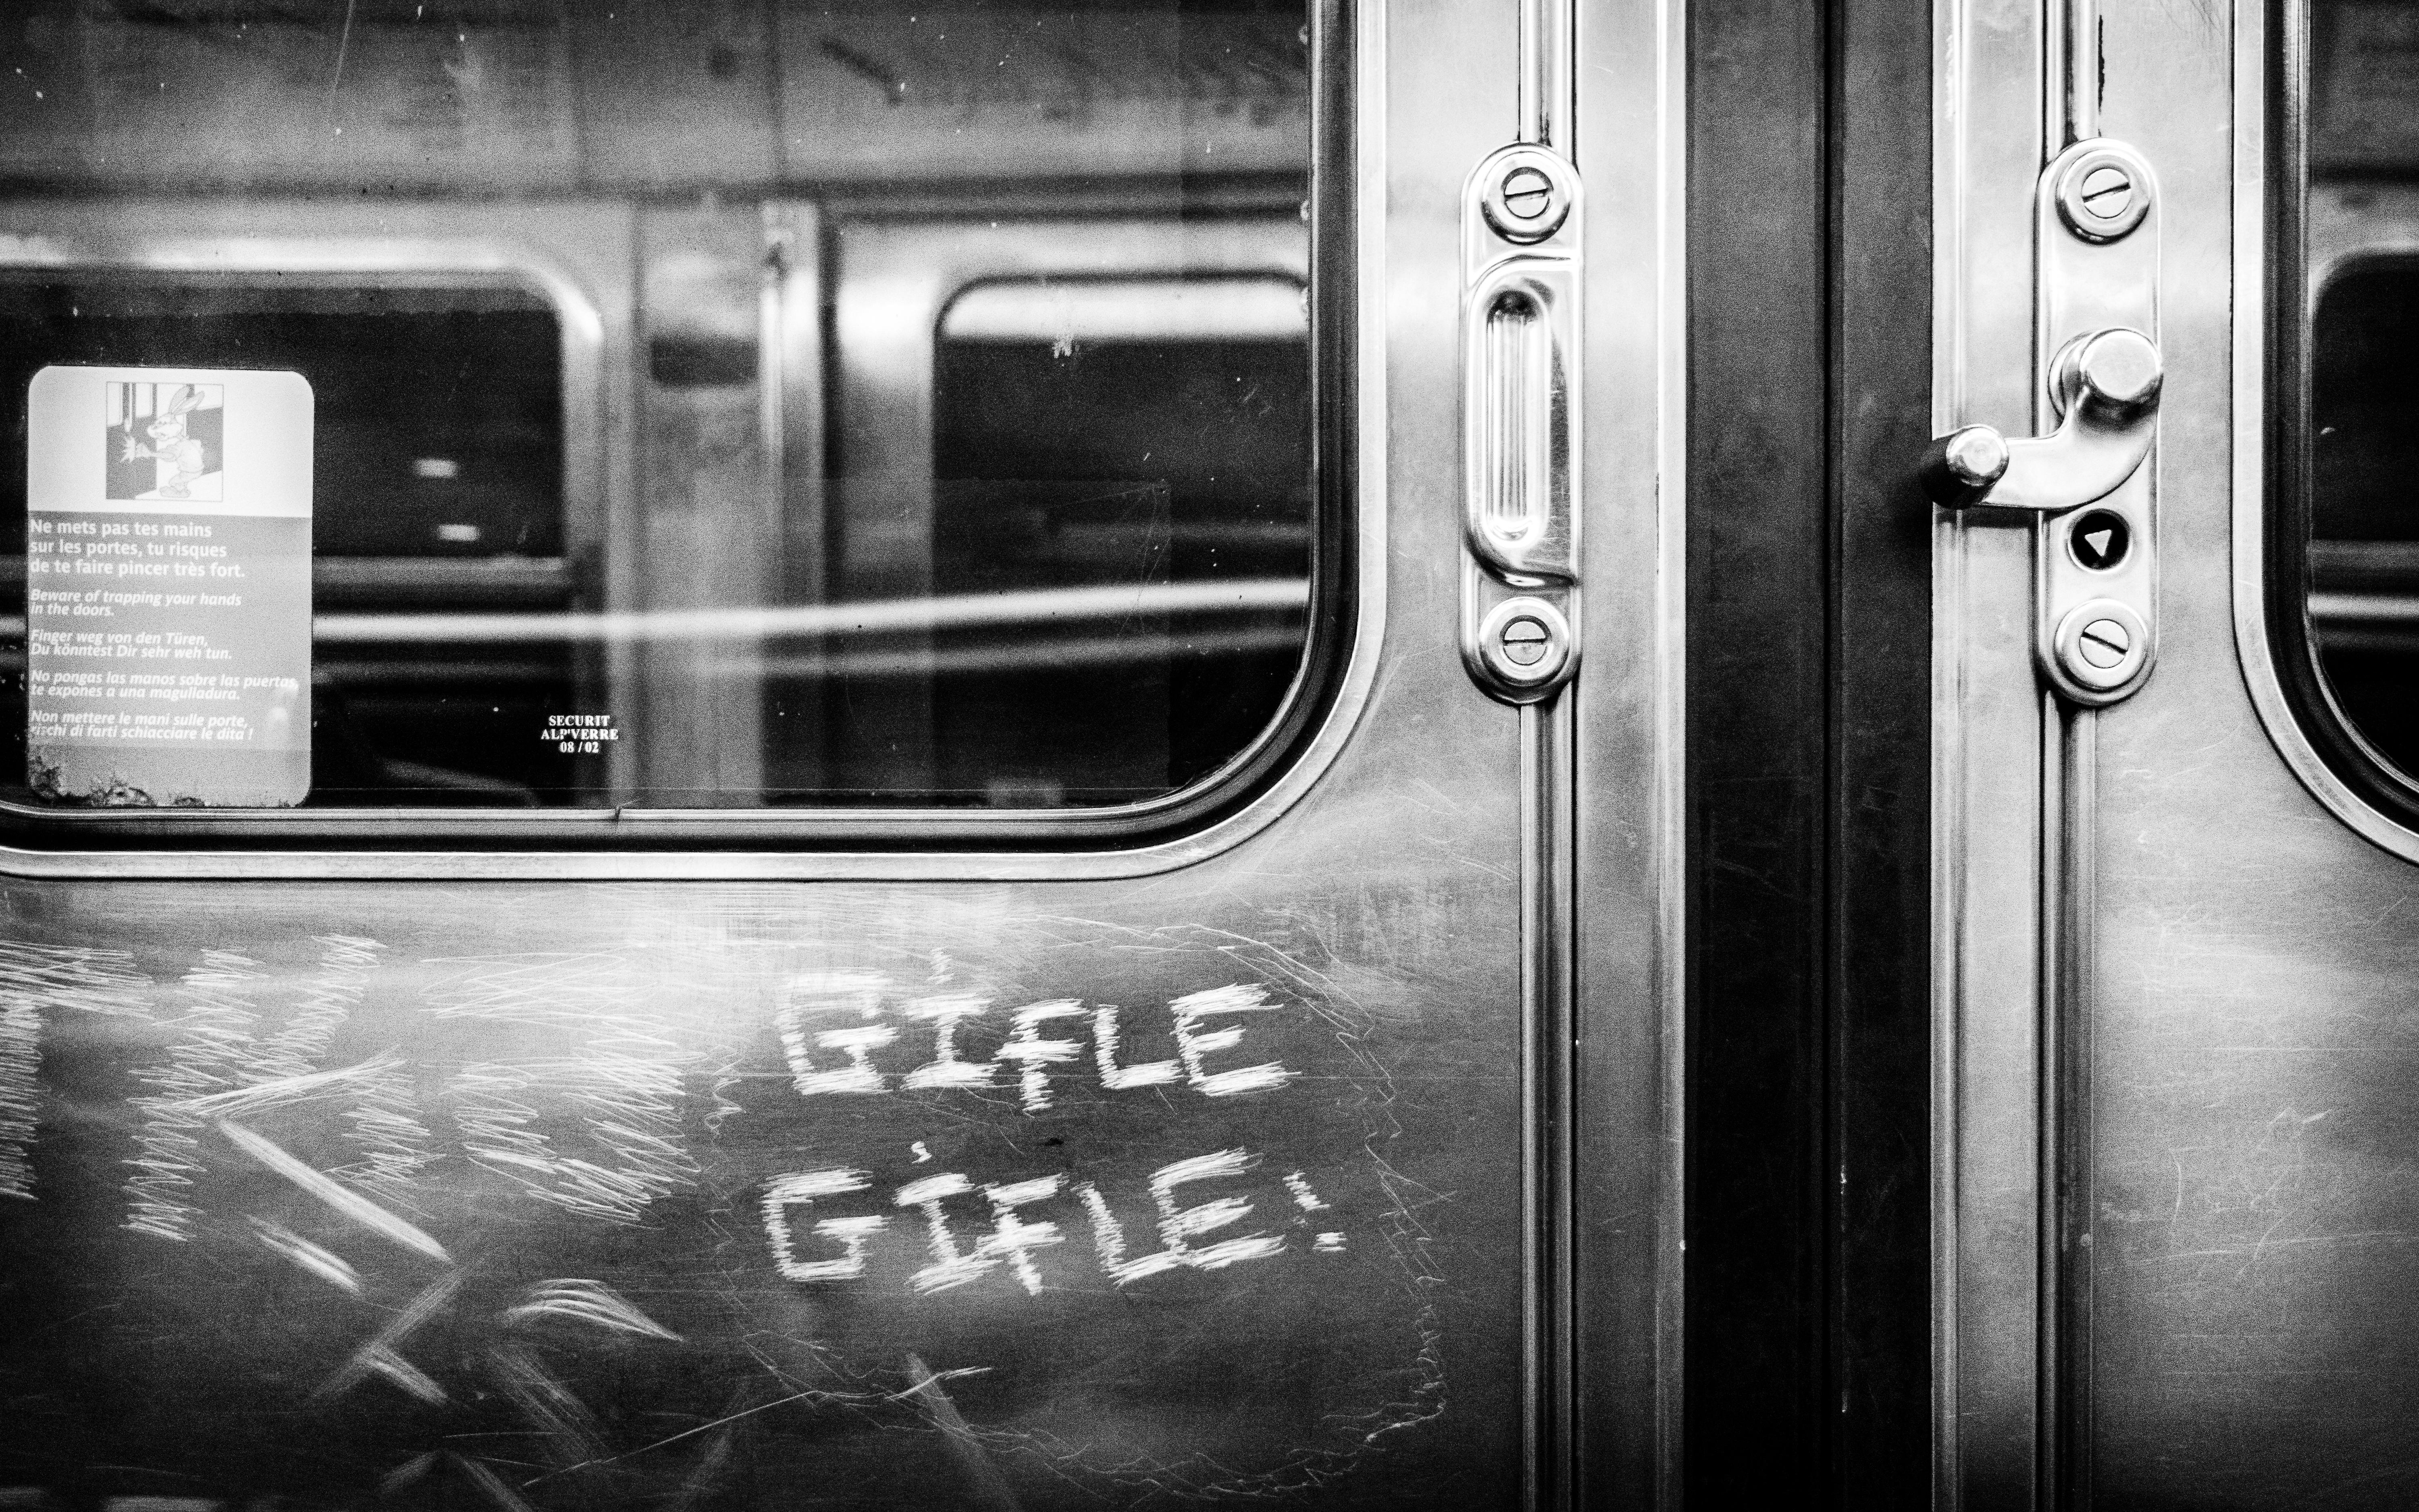 metro in life